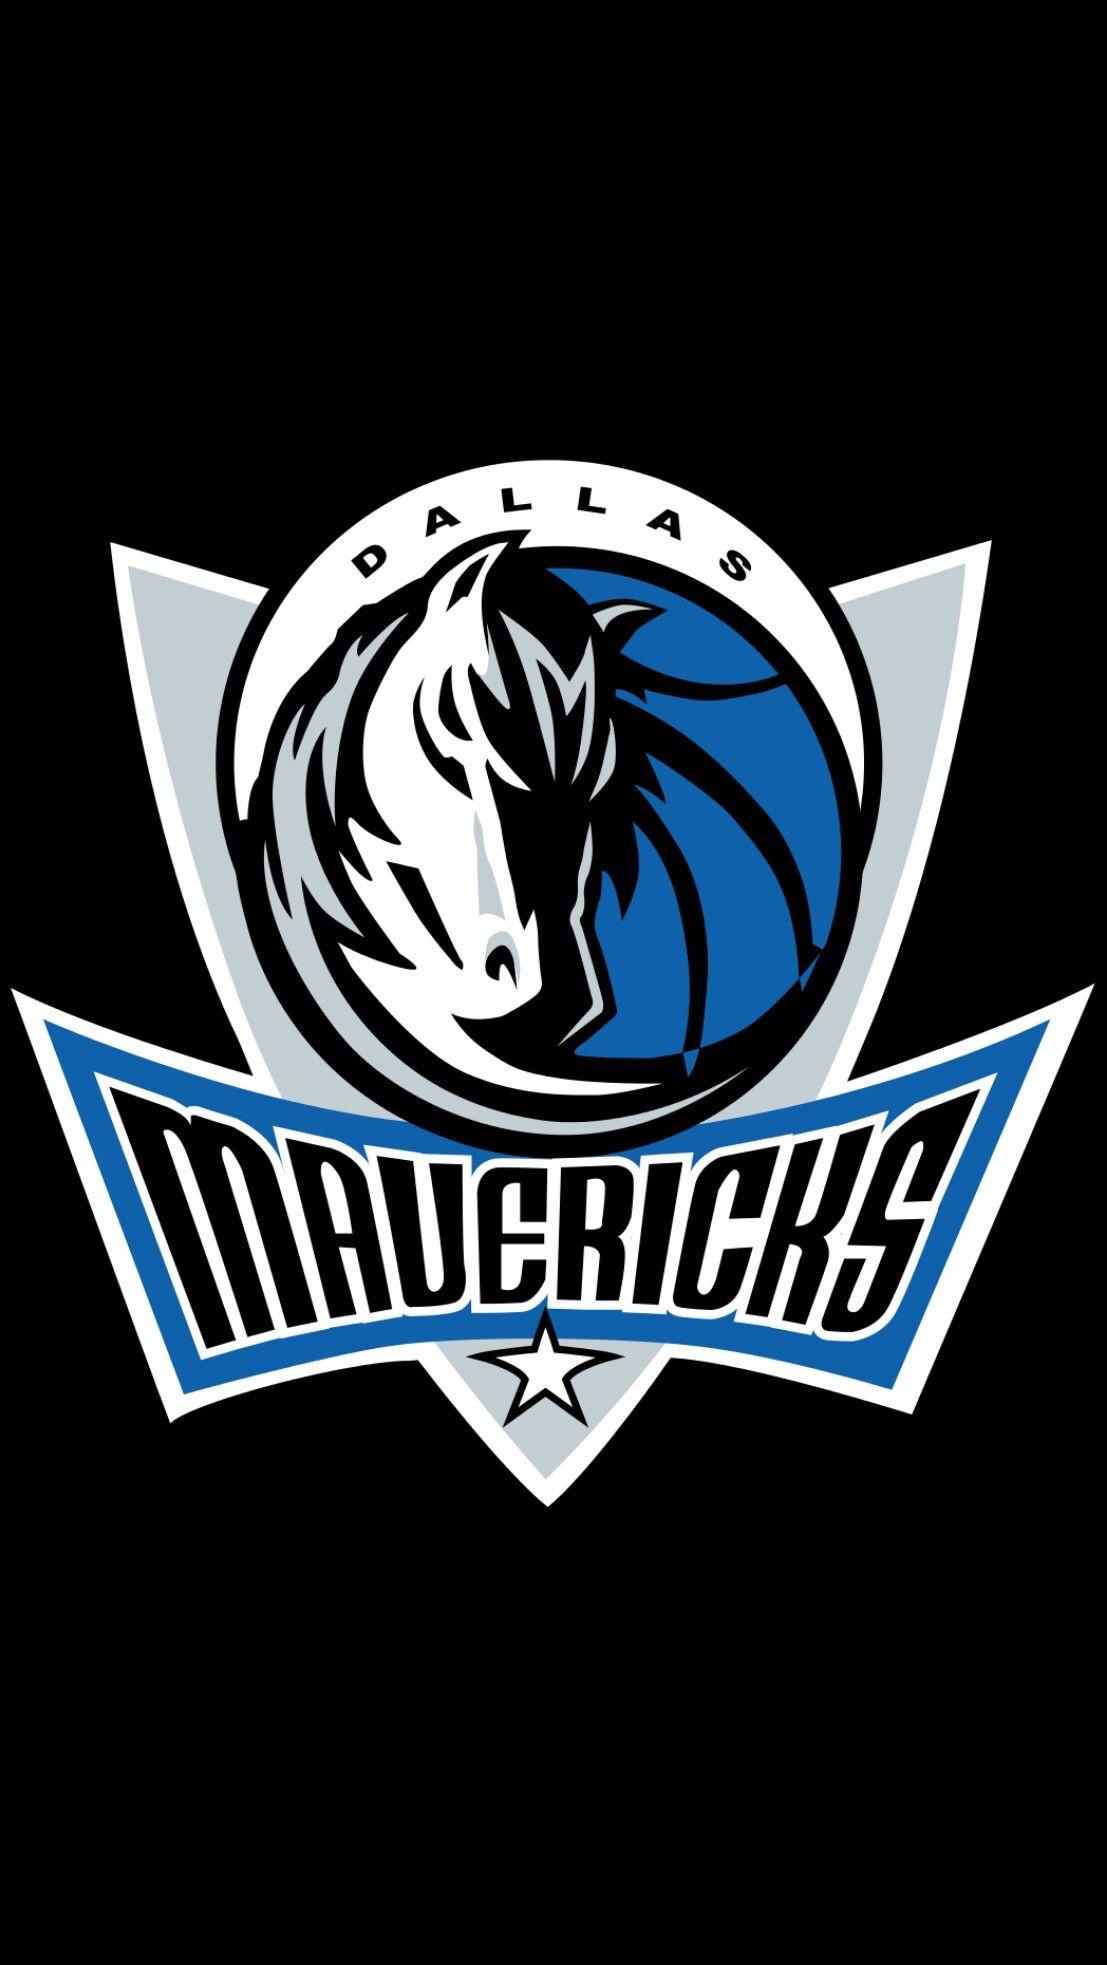 Nba Wallpaper Iphone Android Nba Wallpapers Basketball Game Outfit Mavericks Basketball